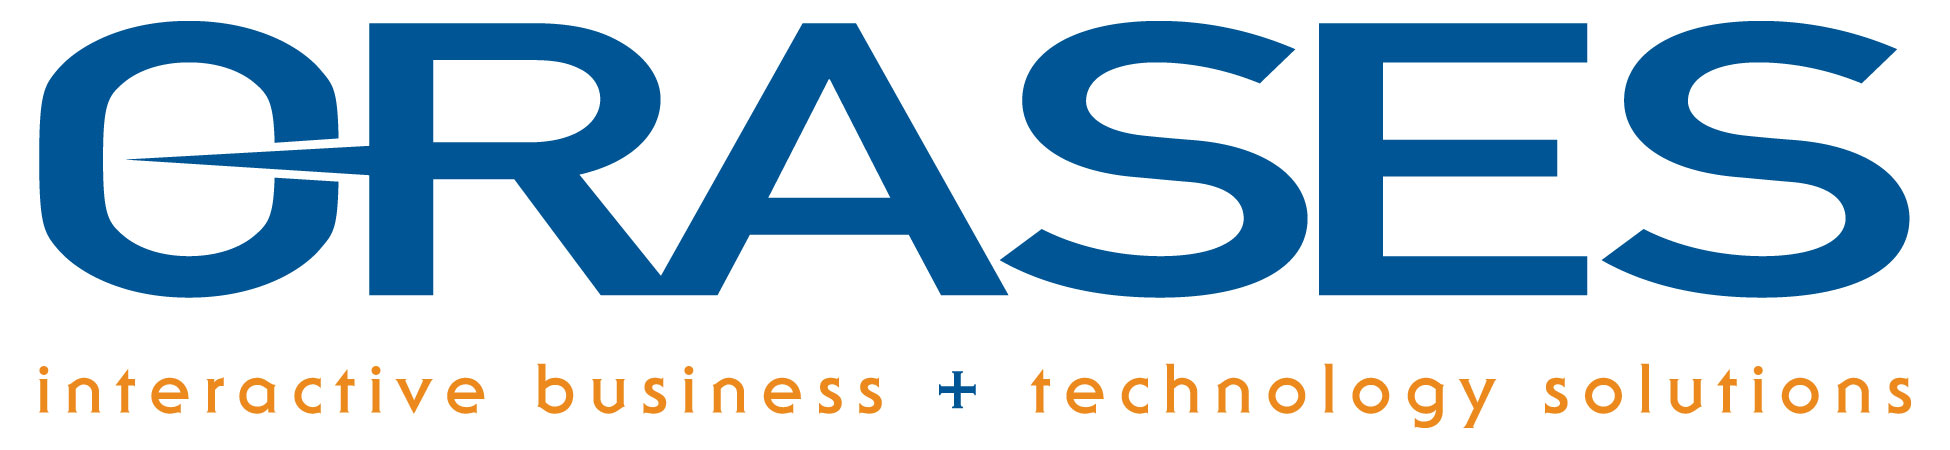 Orases_logo.jpg